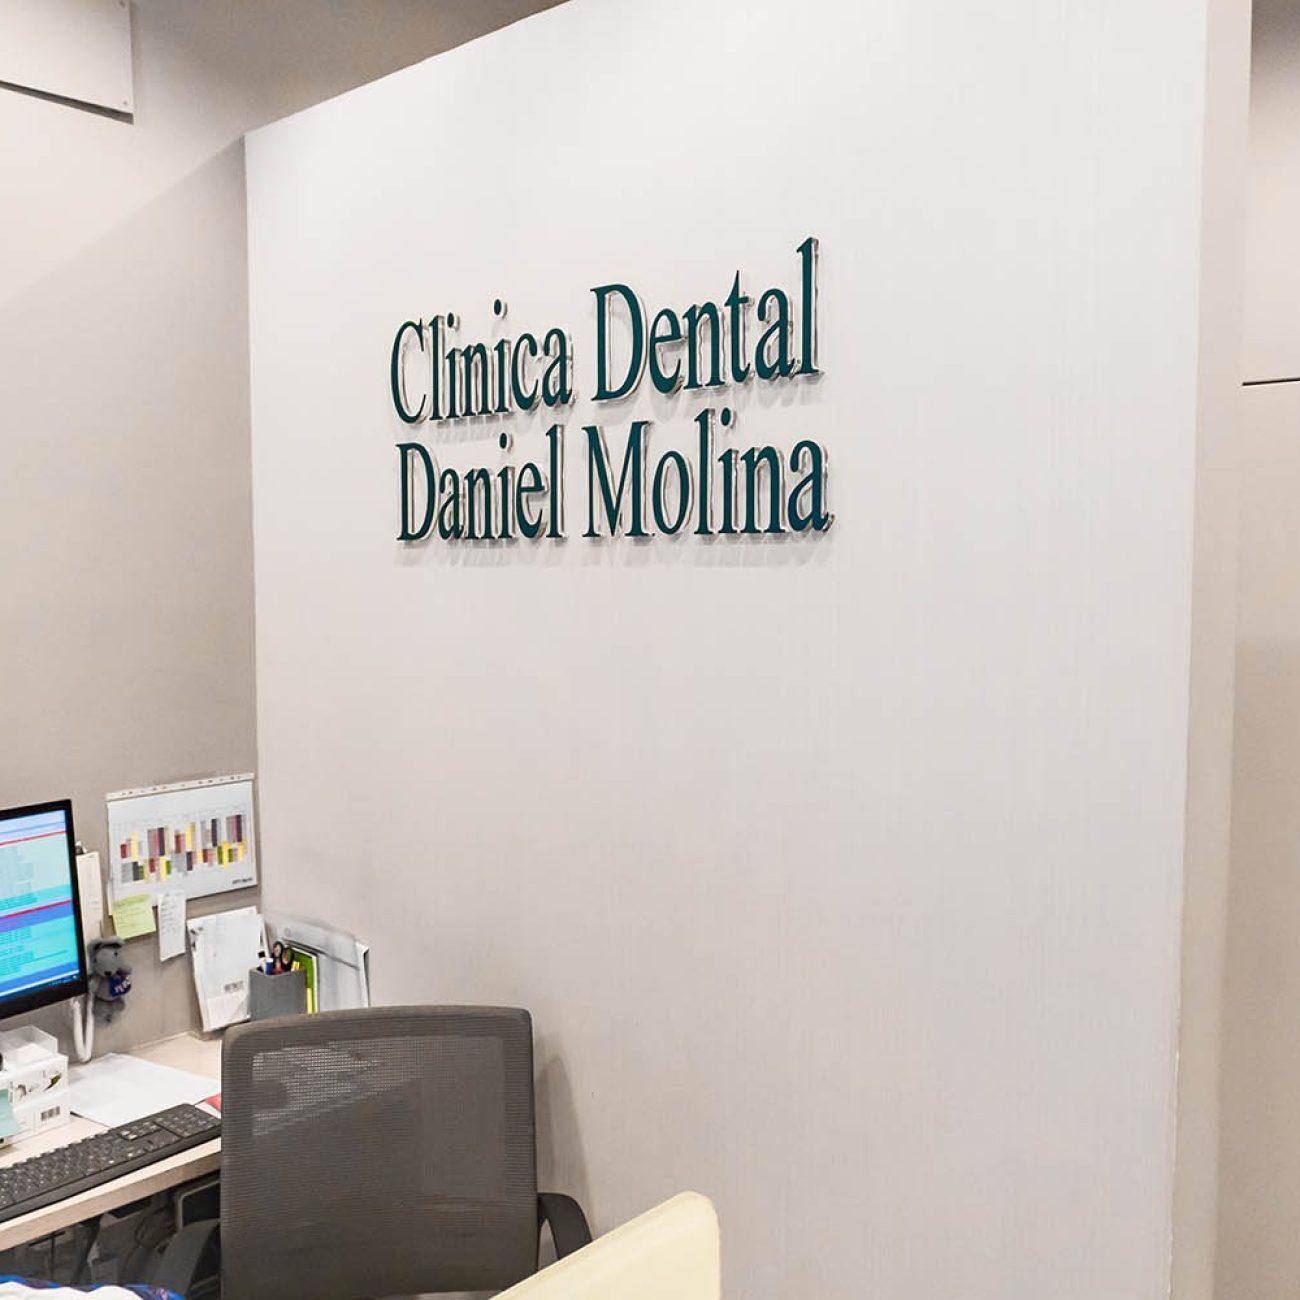 CLINICA DENTAL DANIEL MOLINA